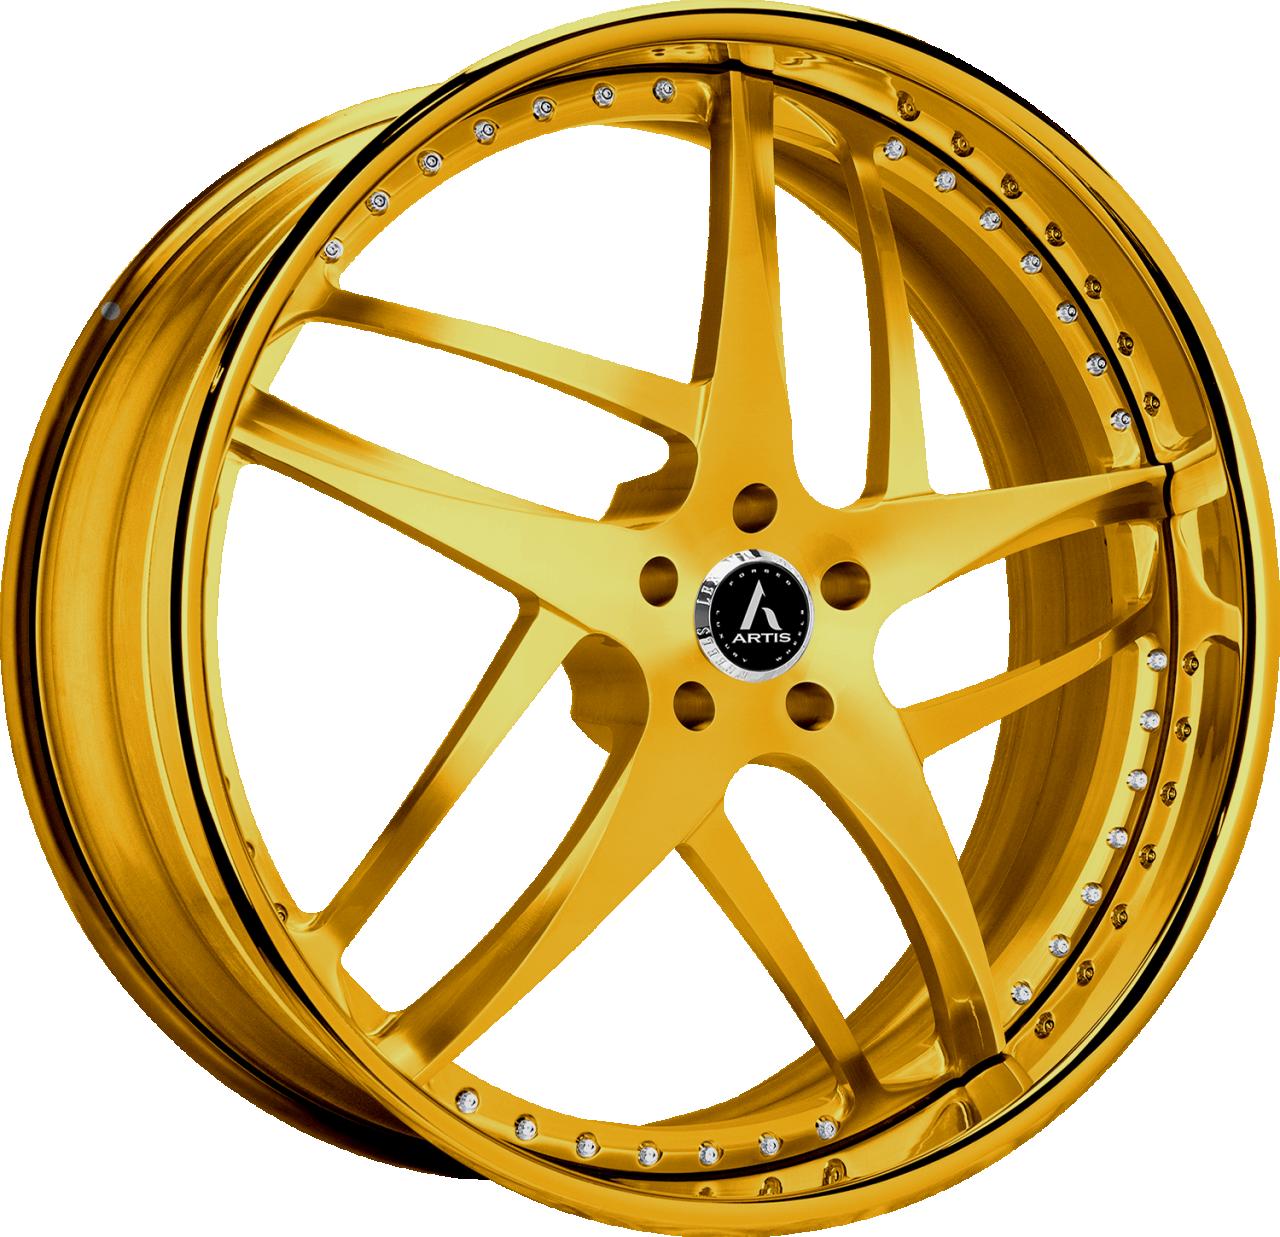 Artis Forged Bavaria wheel with Custom Gold finish